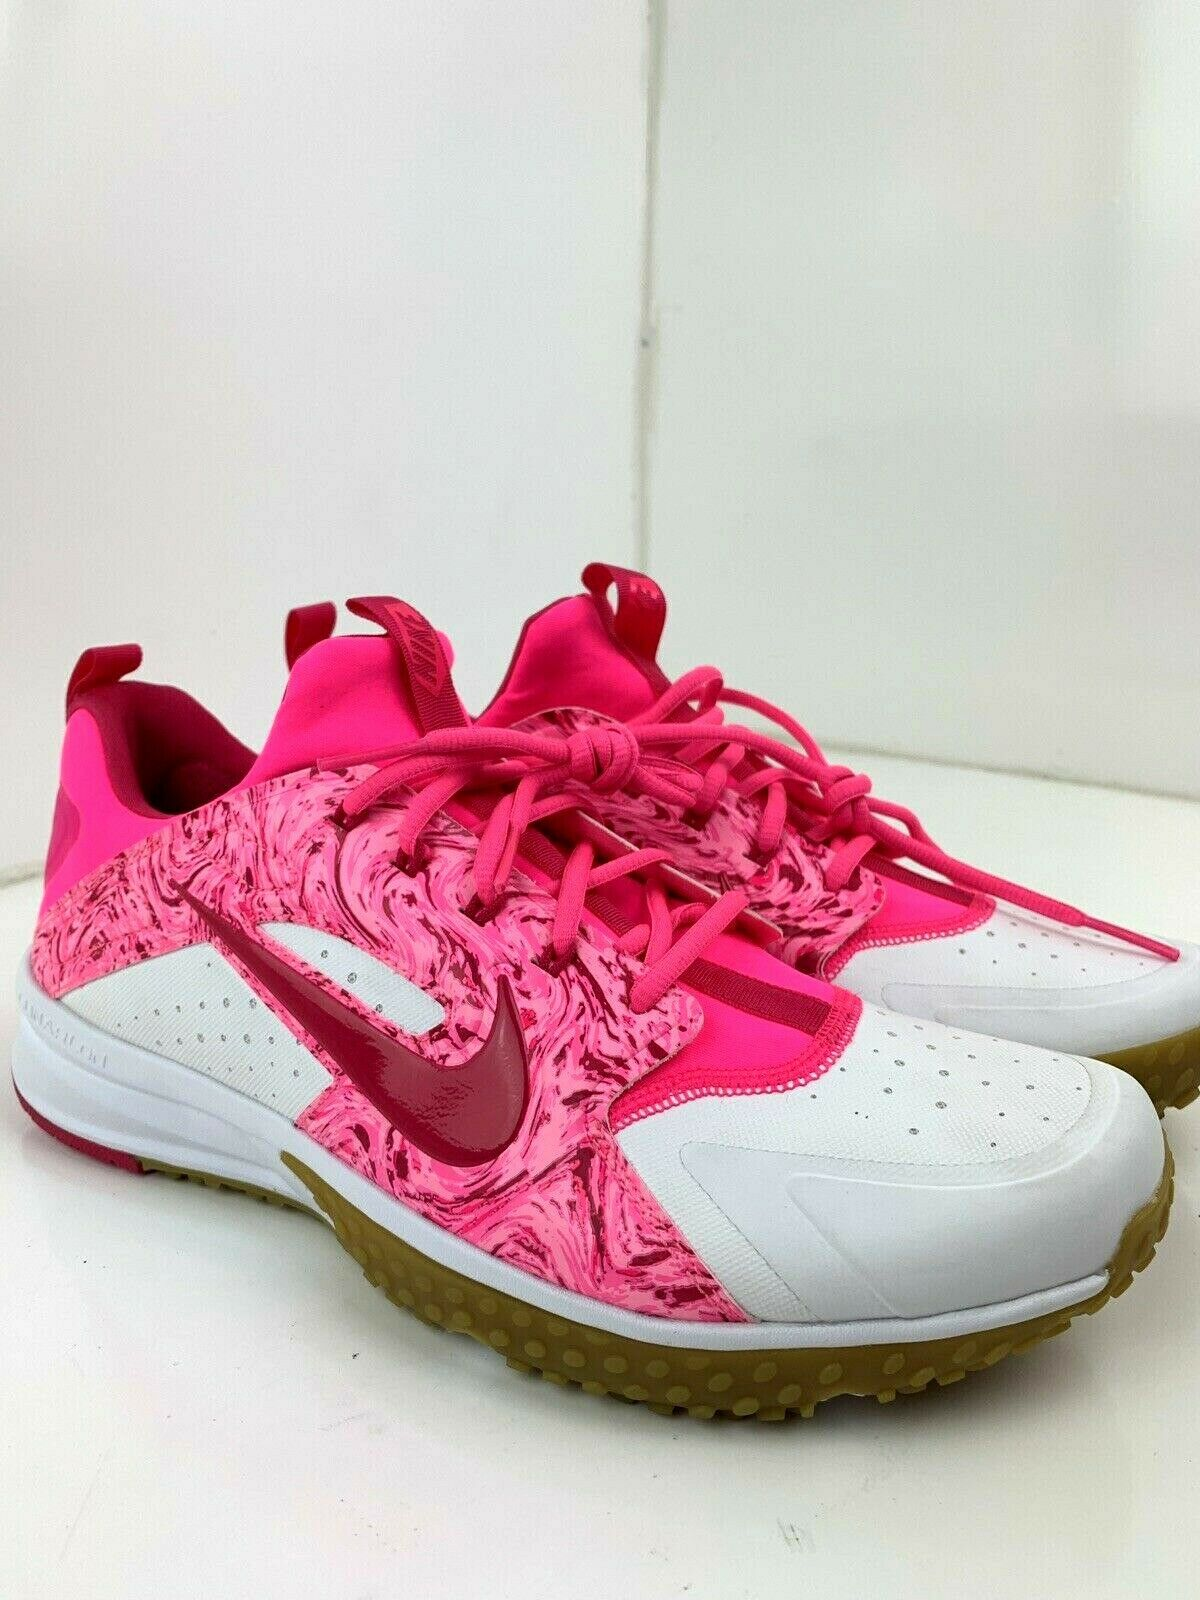 2b91604197710 Nike Men s Air Huarache Baseball Turf Trainers Size 11.5 shoes 923435-101  c7be8e